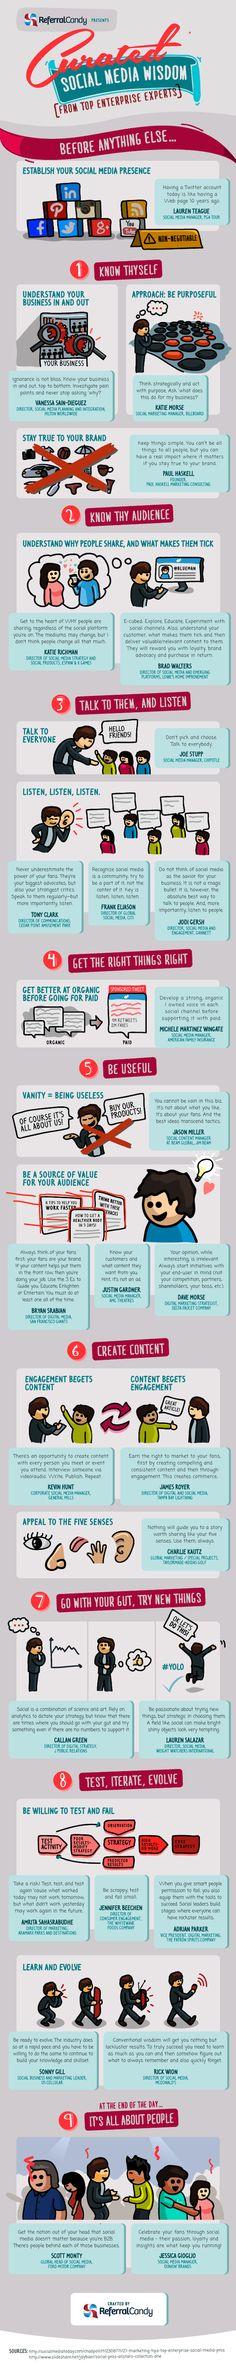 Social Media Wisdom | #Infographic #SocialMedia #SocialMediaMarketing #eCommerce #mCommerce #SocialMediaCommerce